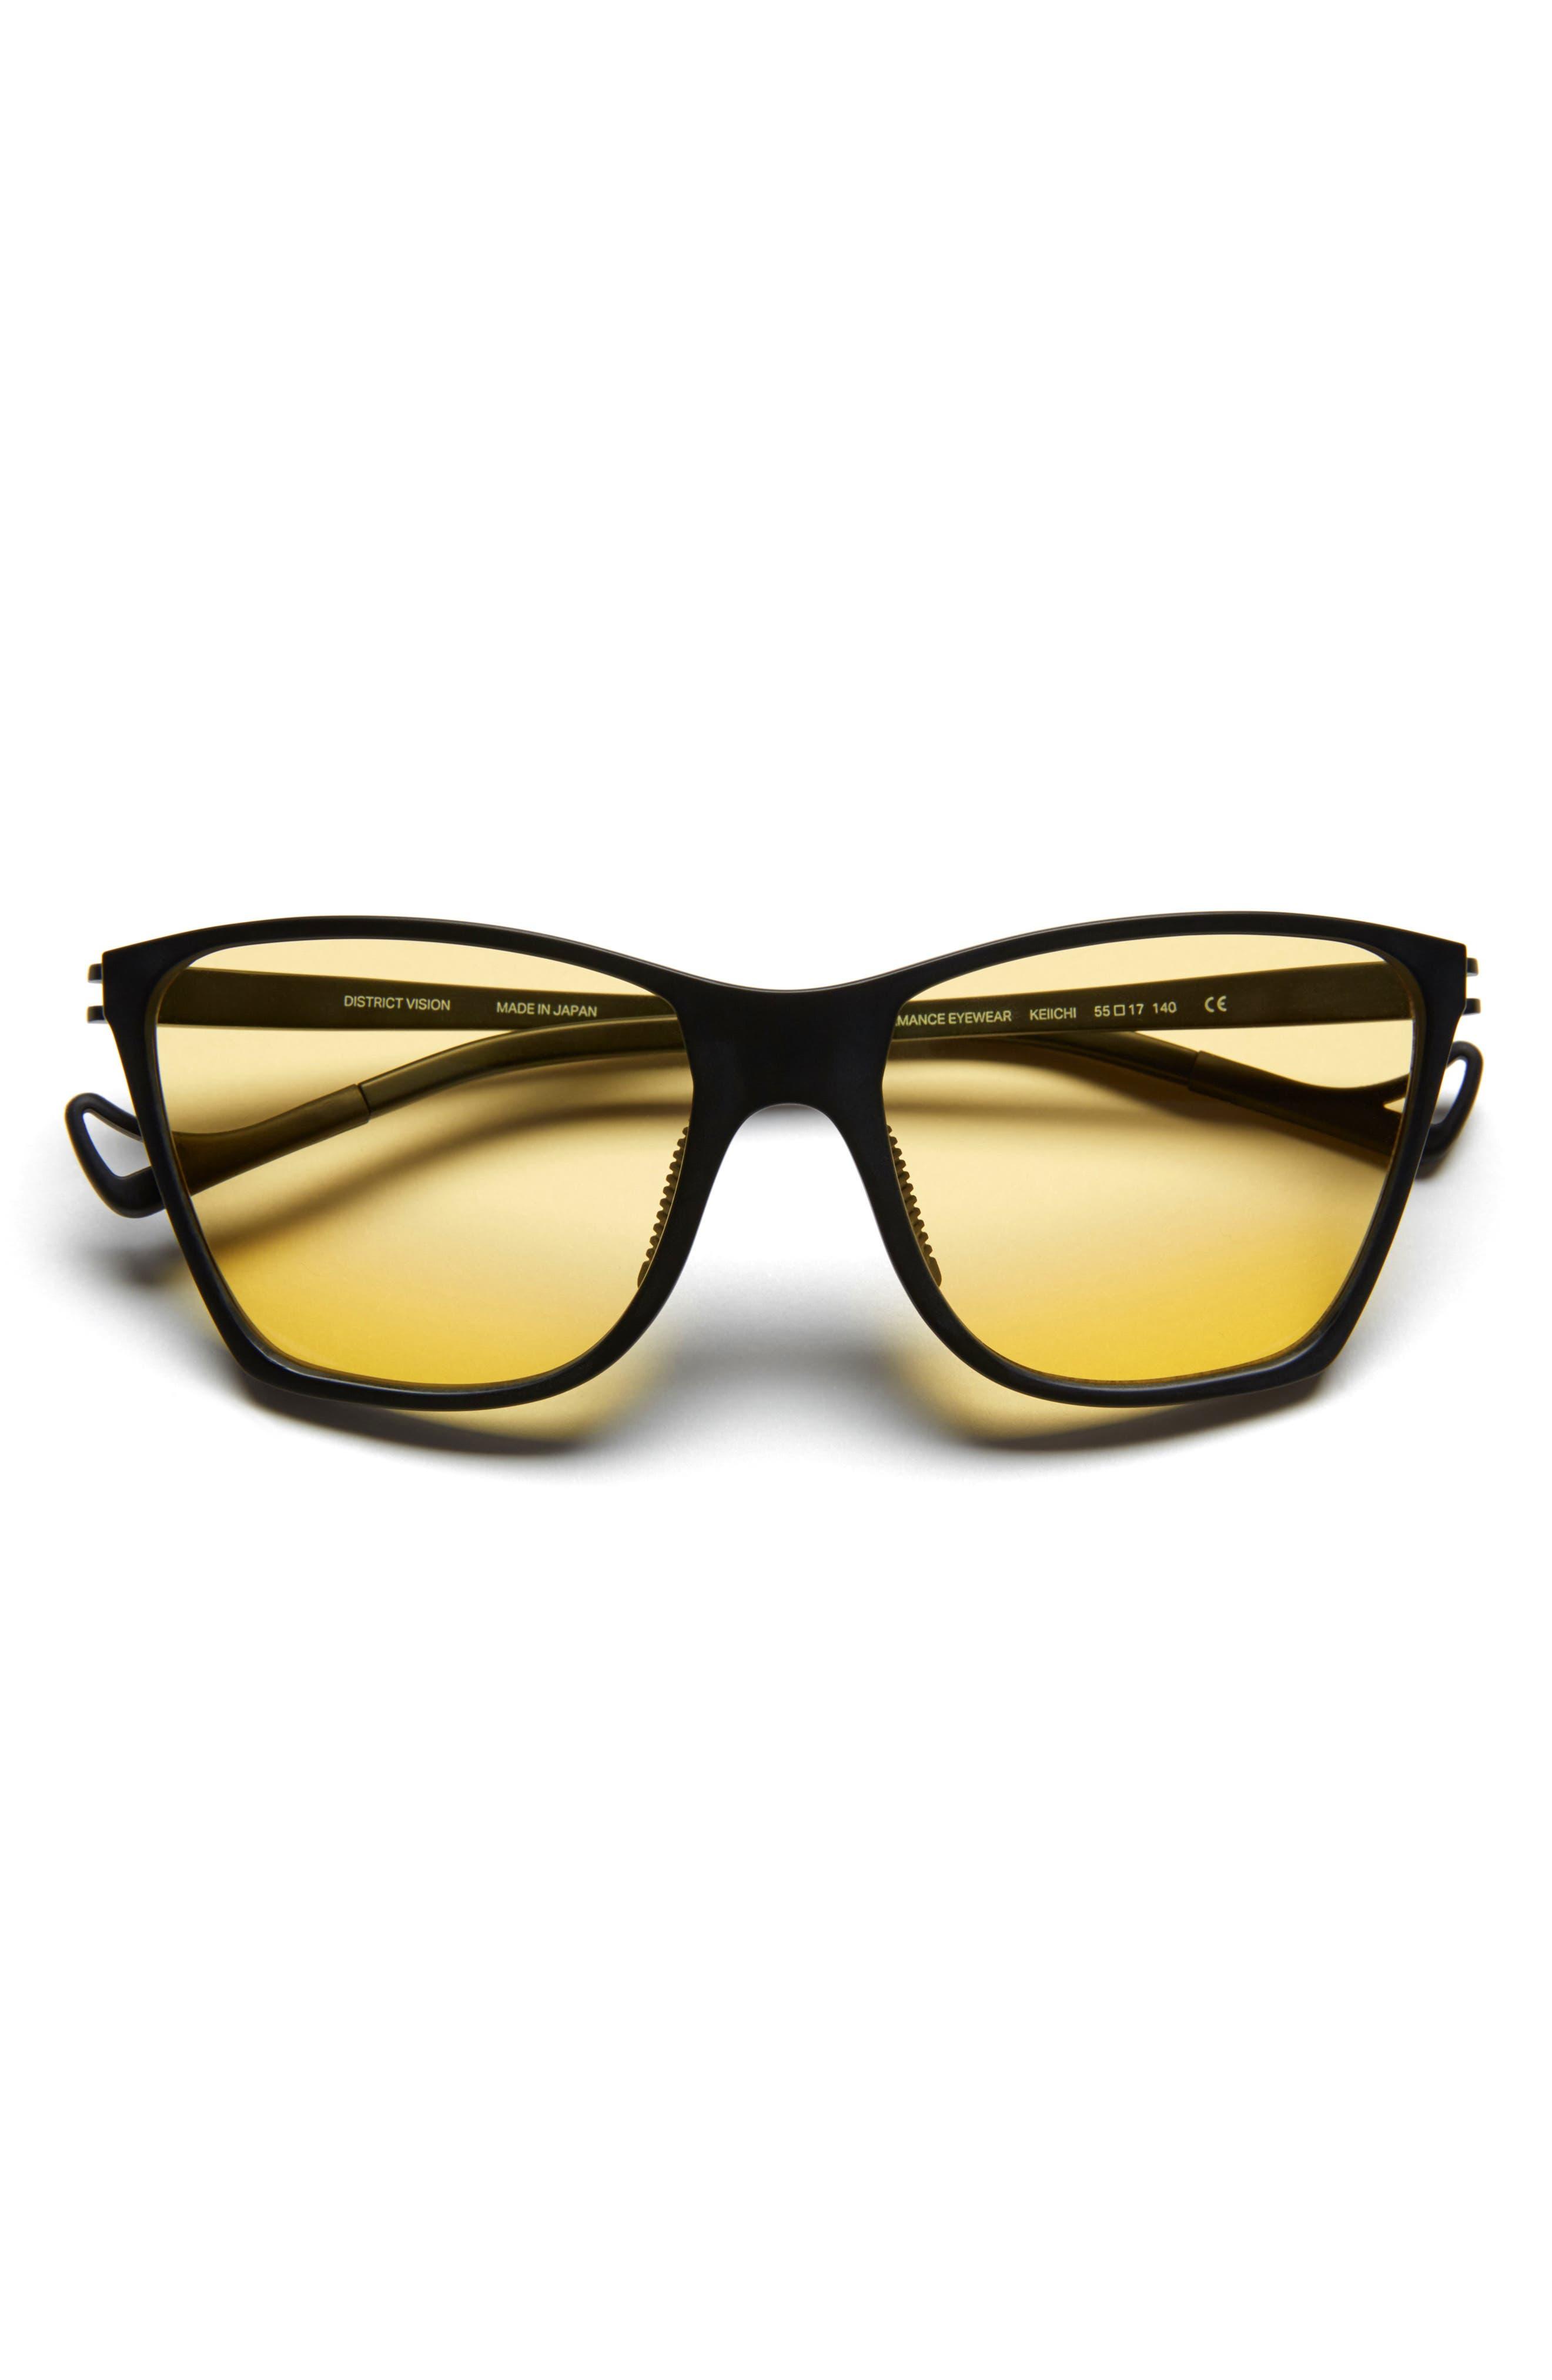 Keiichi Standard 55mm Sunglasses,                             Alternate thumbnail 2, color,                             BLACK/ YELLOW